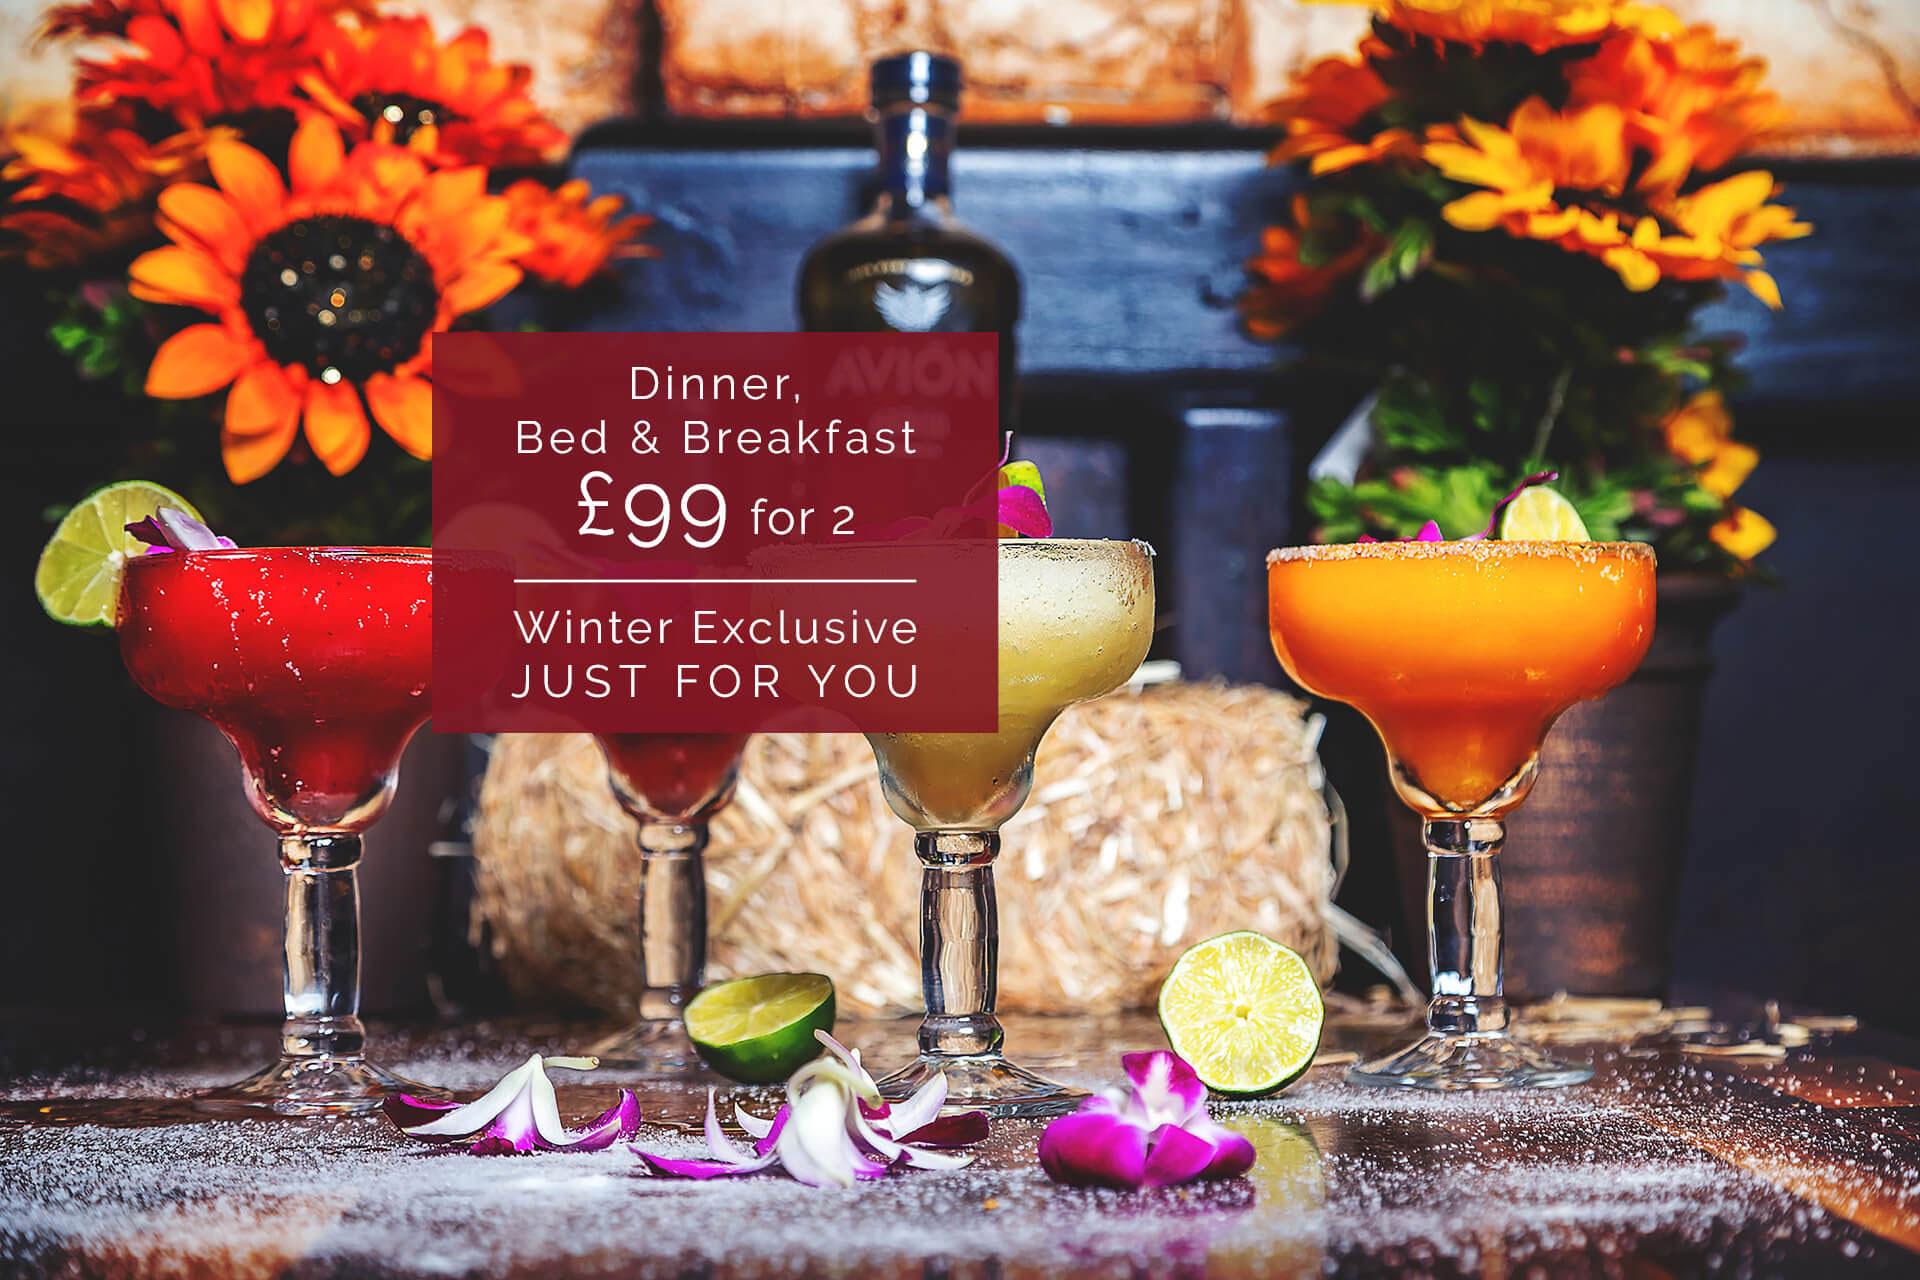 Smiths WINTEX £99 Dinner, Bed   Breakfast